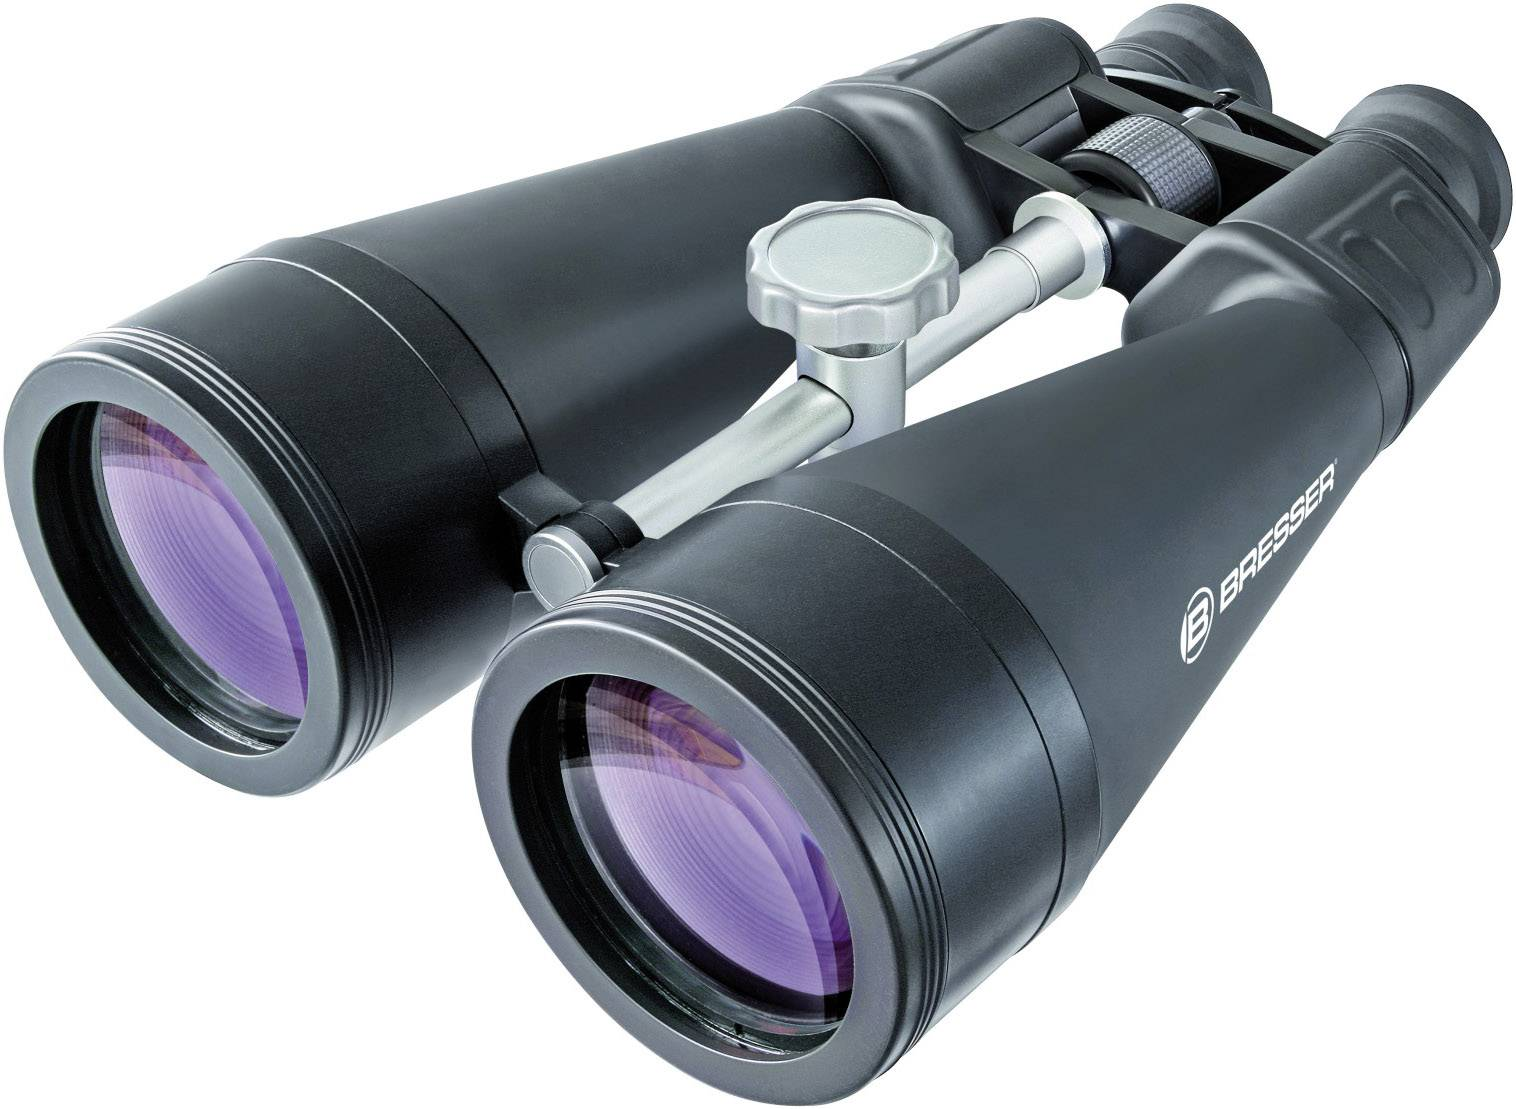 Bresser optik binocom gal porro marine fernglas mm schwarz